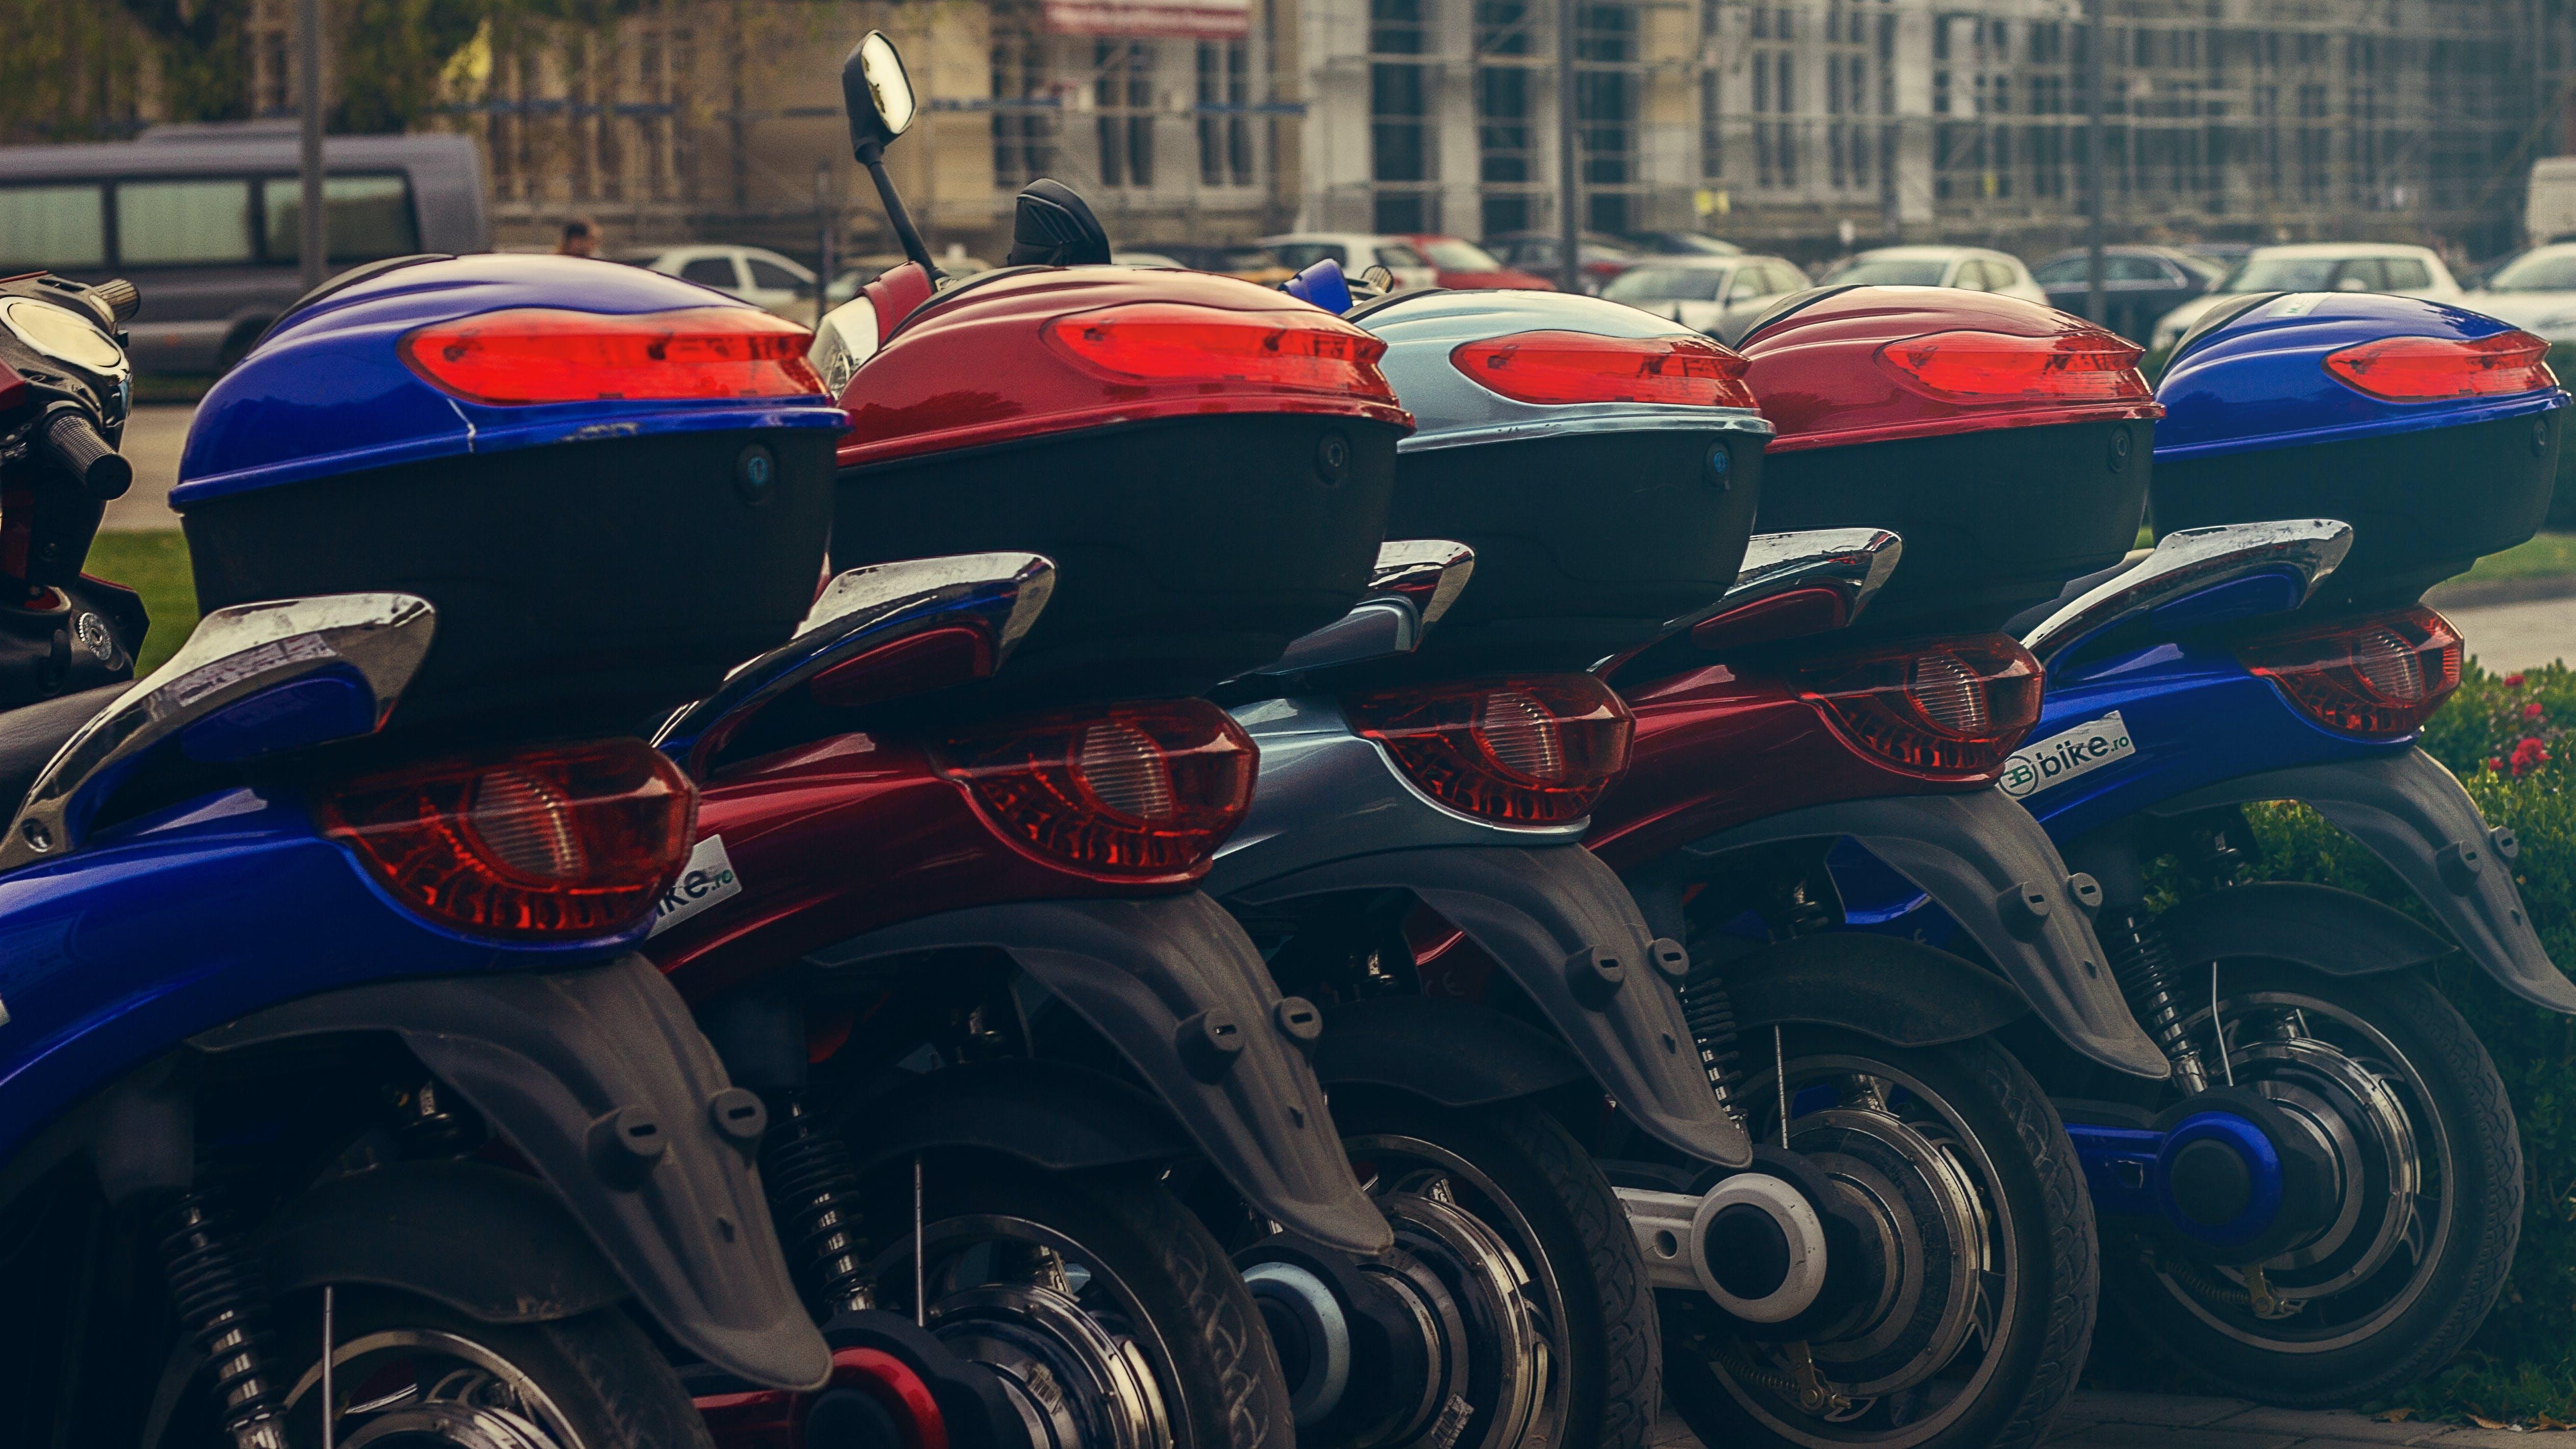 Free stock photo of vehicles, bikes, wheels, electric